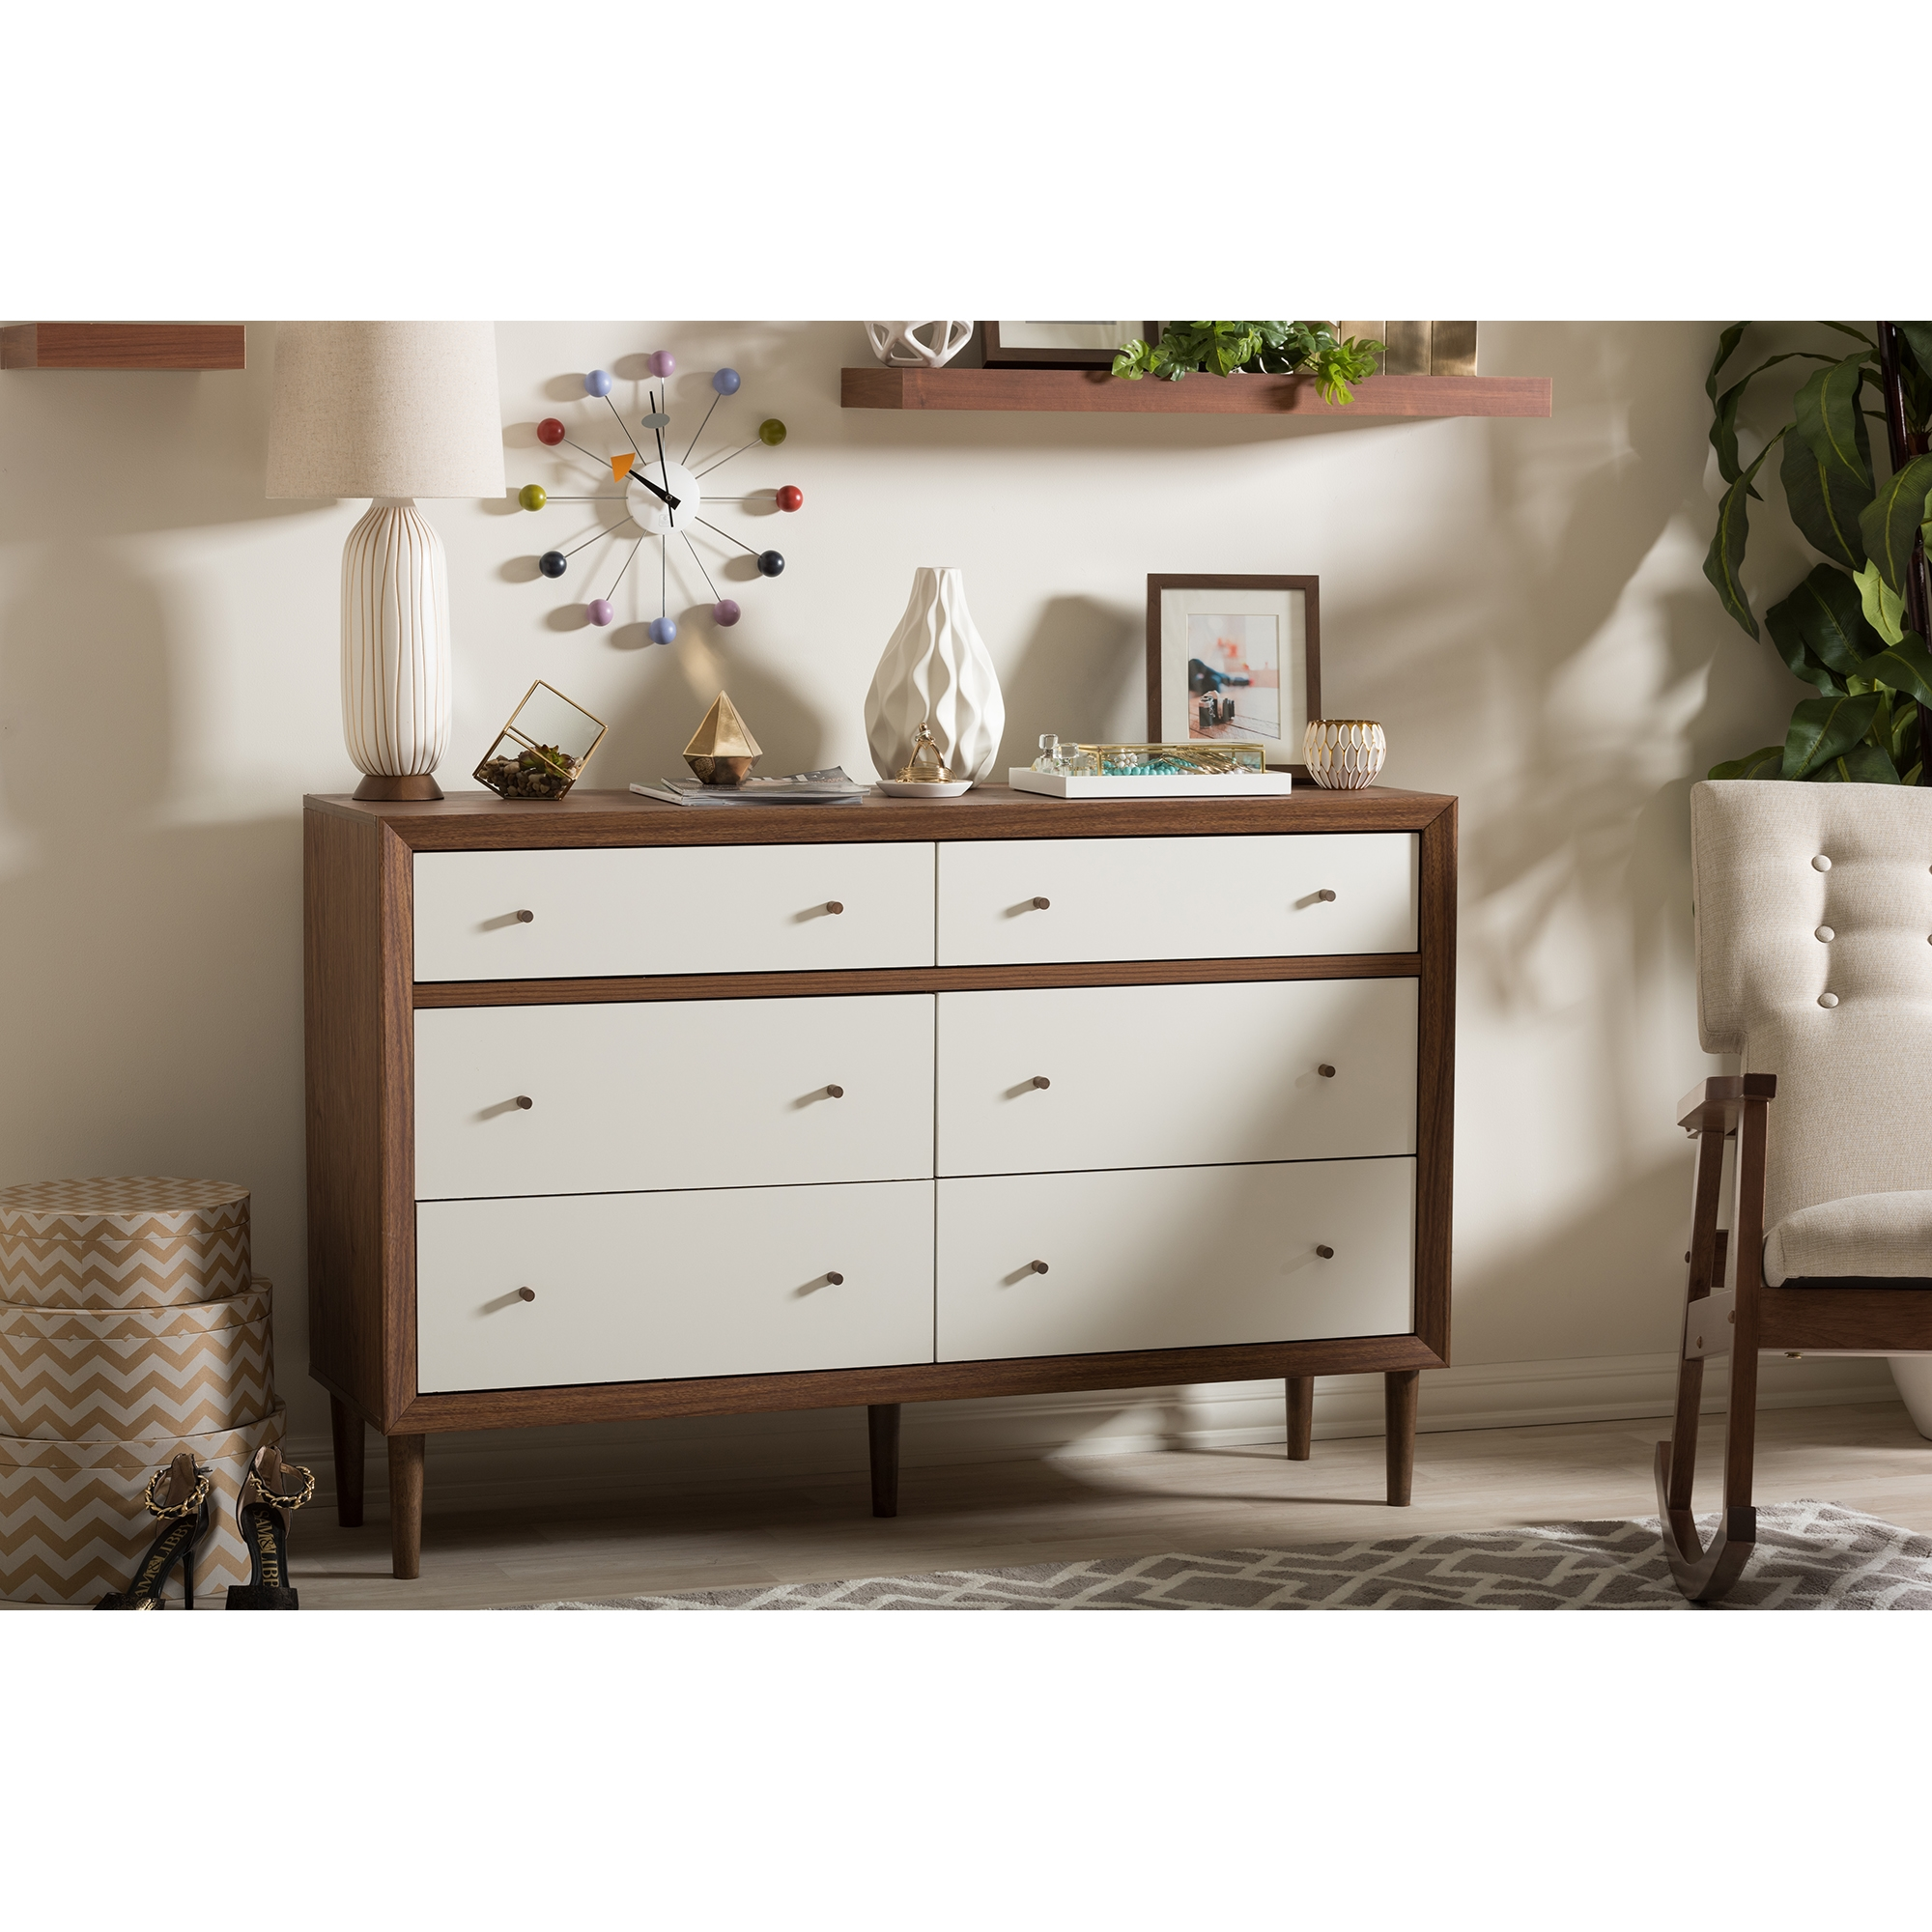 ... Baxton Studio Harlow Mid Century Modern Scandinavian Style White And  Walnut Wood 6 Drawer